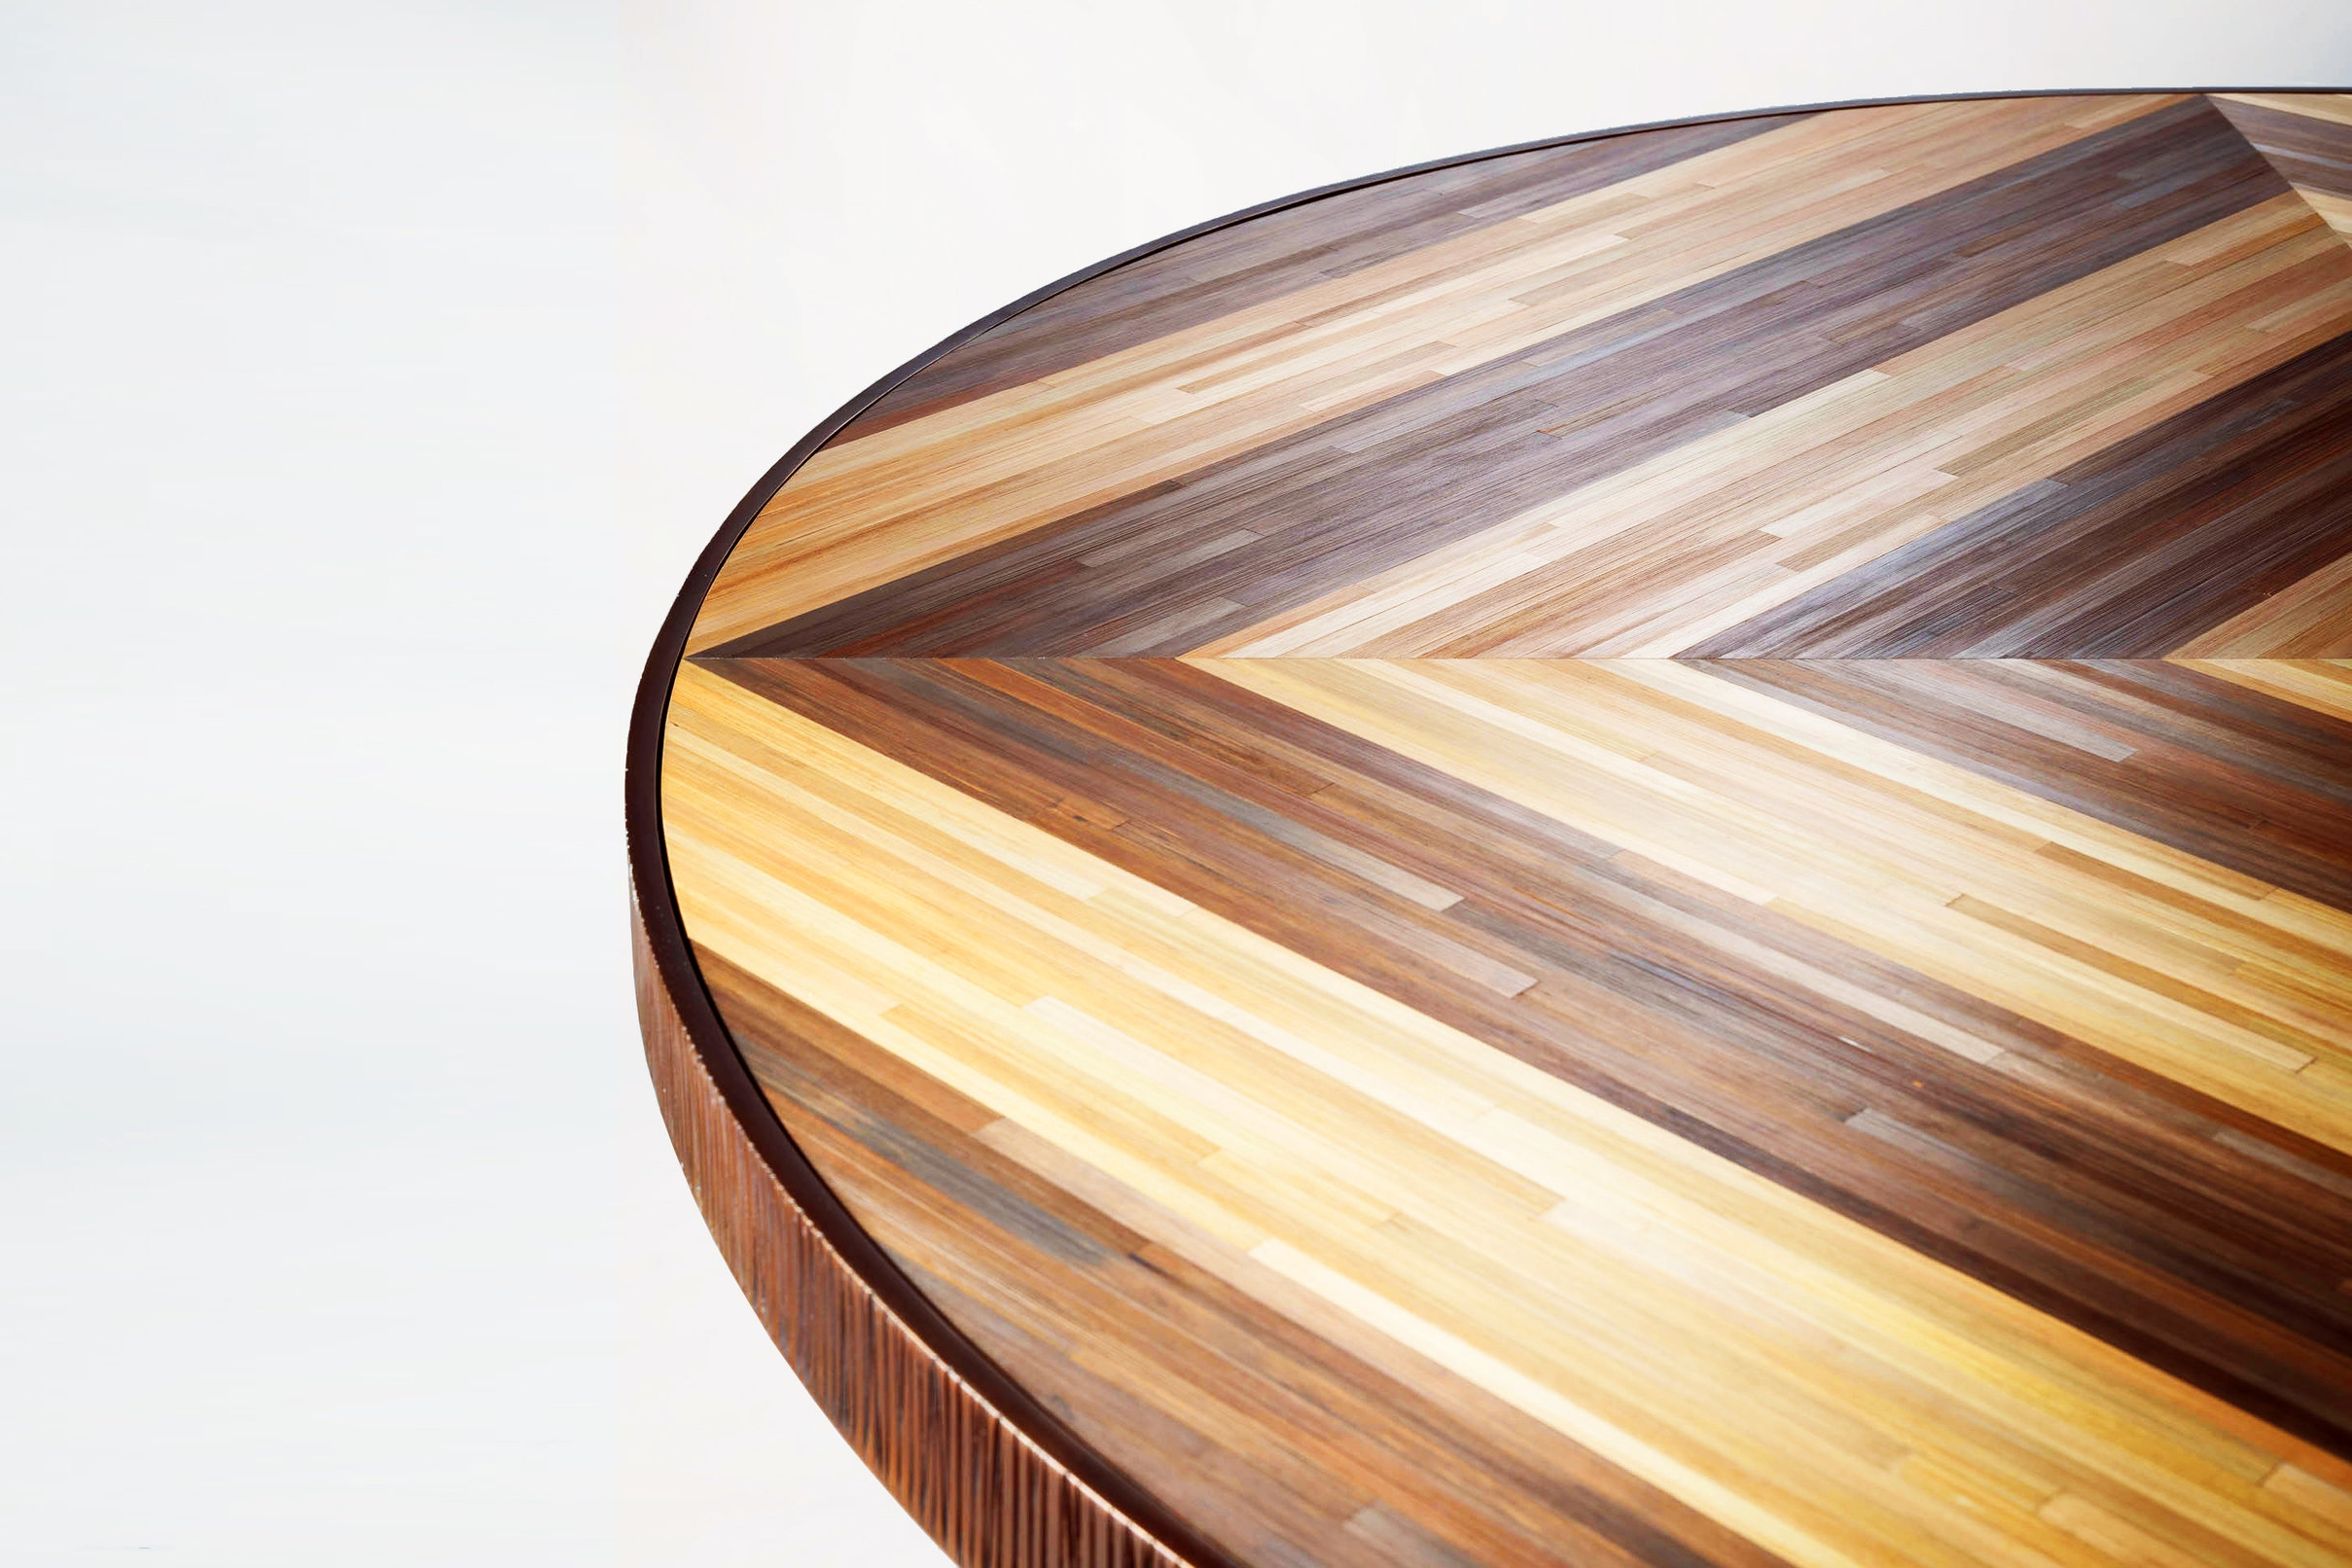 Baku centre table-0660-LOW-RESrev01.jpg